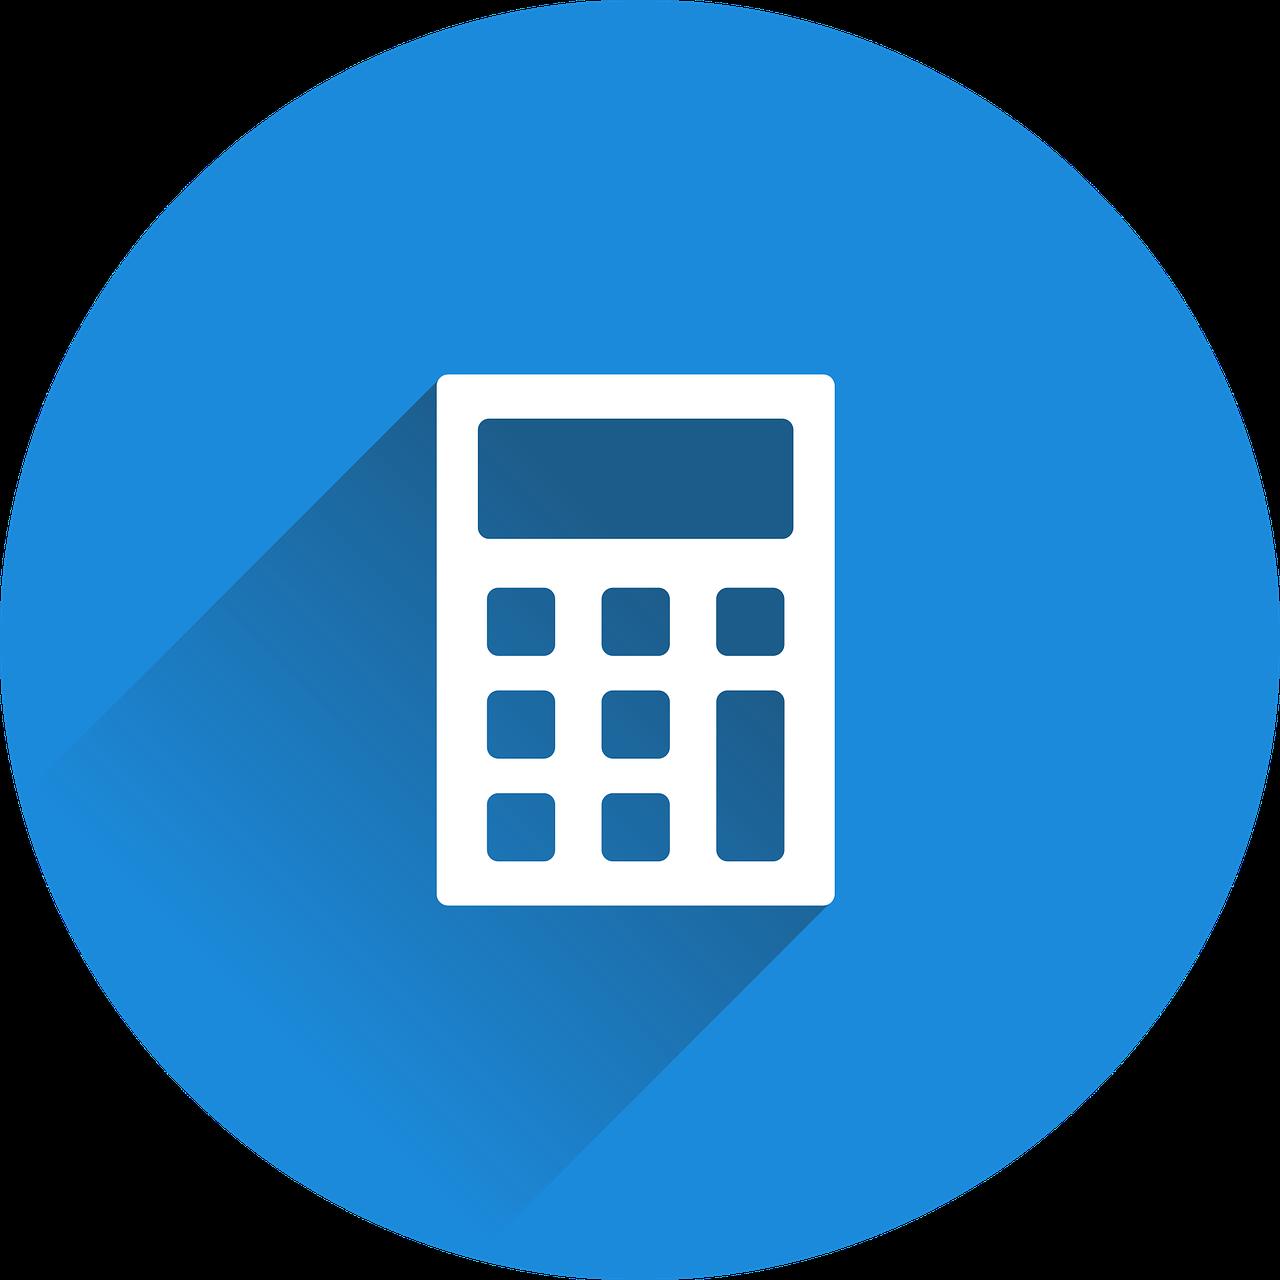 The Gross Net Wage Calculator for Switzerland